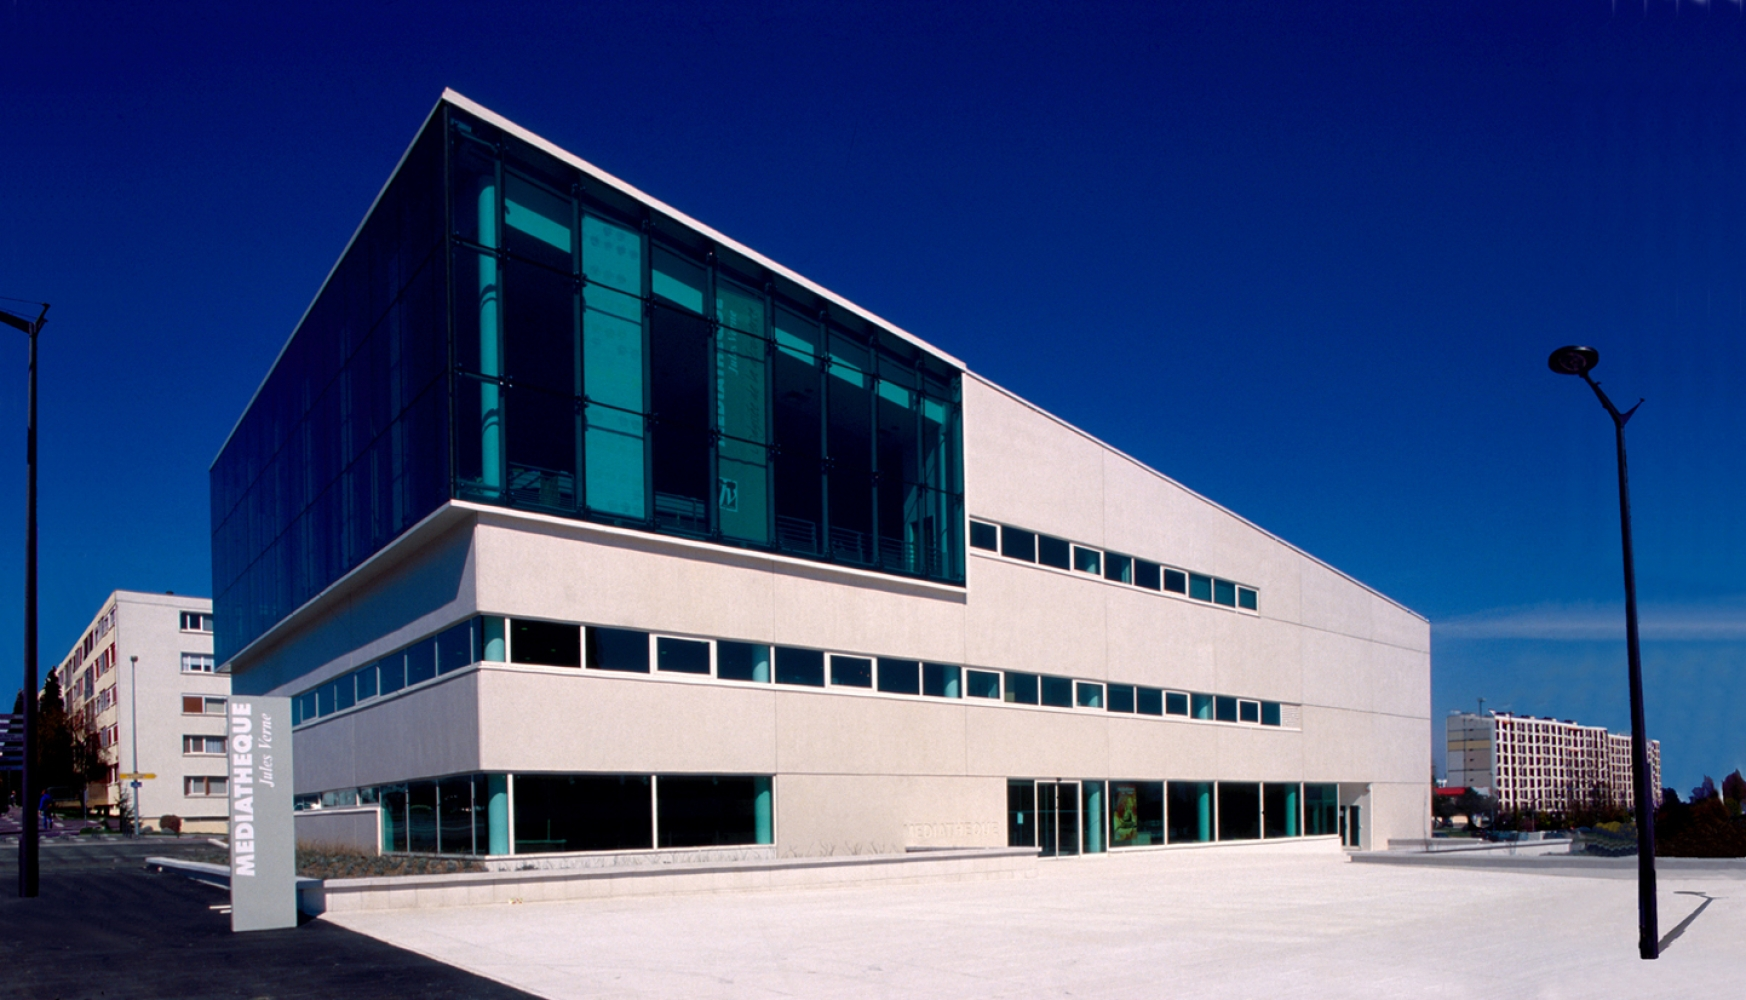 van---01 Pascale SEURIN Architecte - Pascale SEURIN Architecte